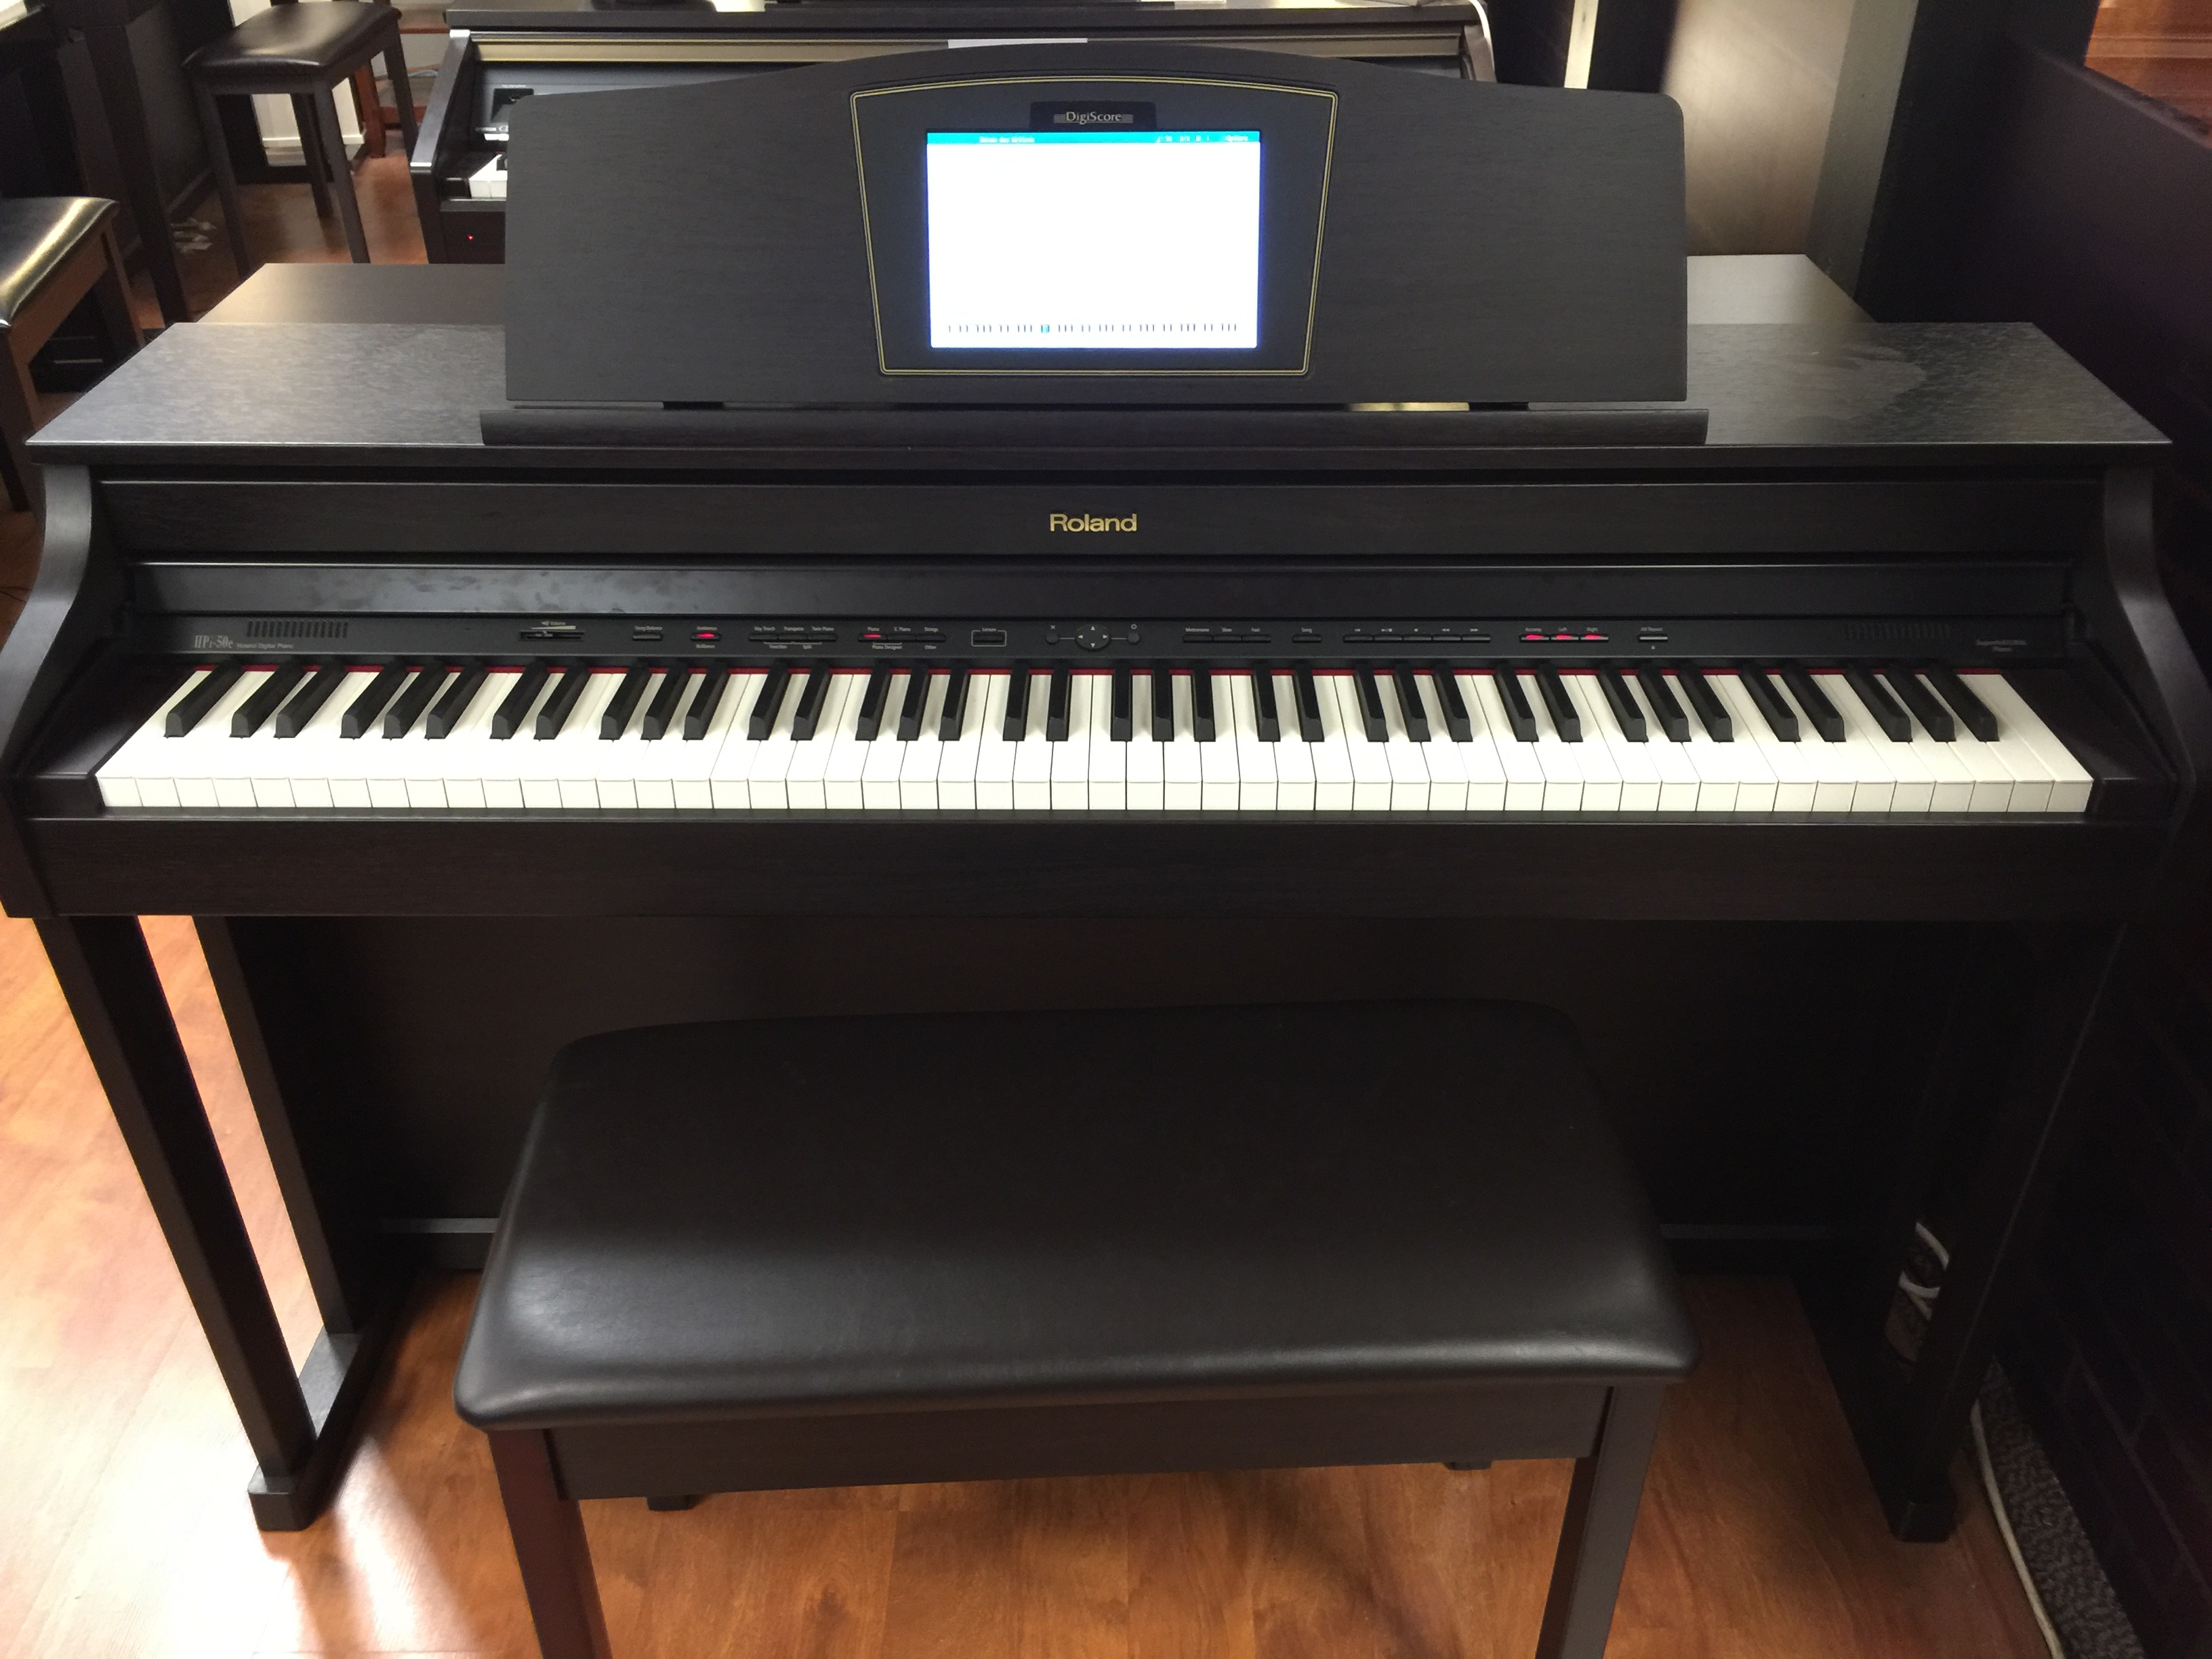 used roland hpi50 digital piano for sale schmitt music. Black Bedroom Furniture Sets. Home Design Ideas